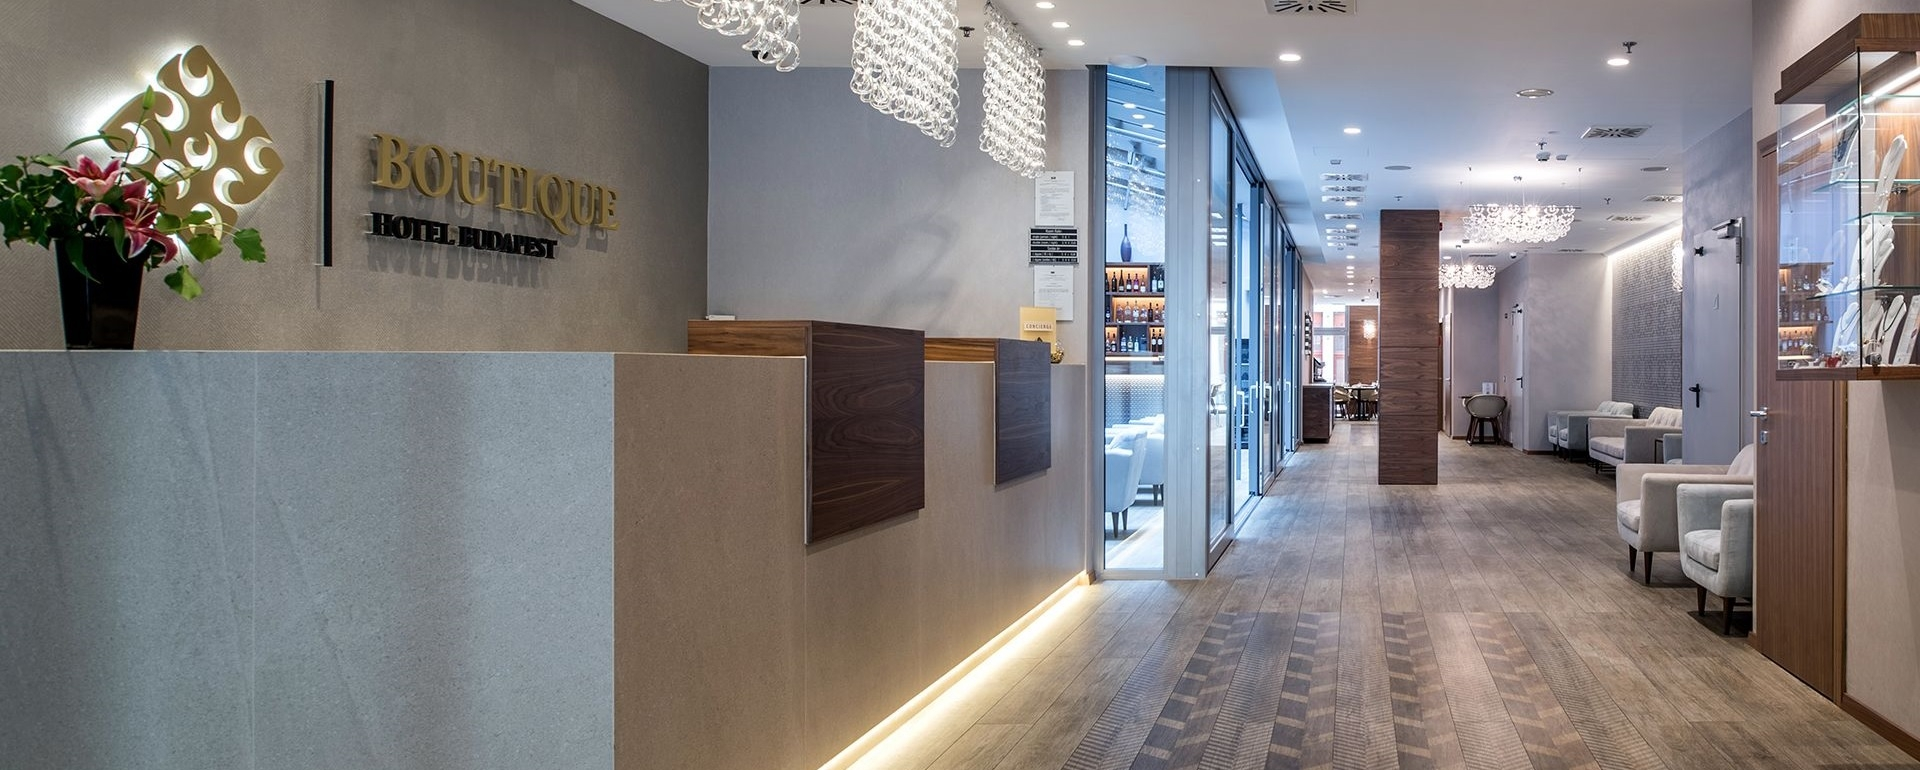 0cb3c5b748 Boutique Hotel Budapest